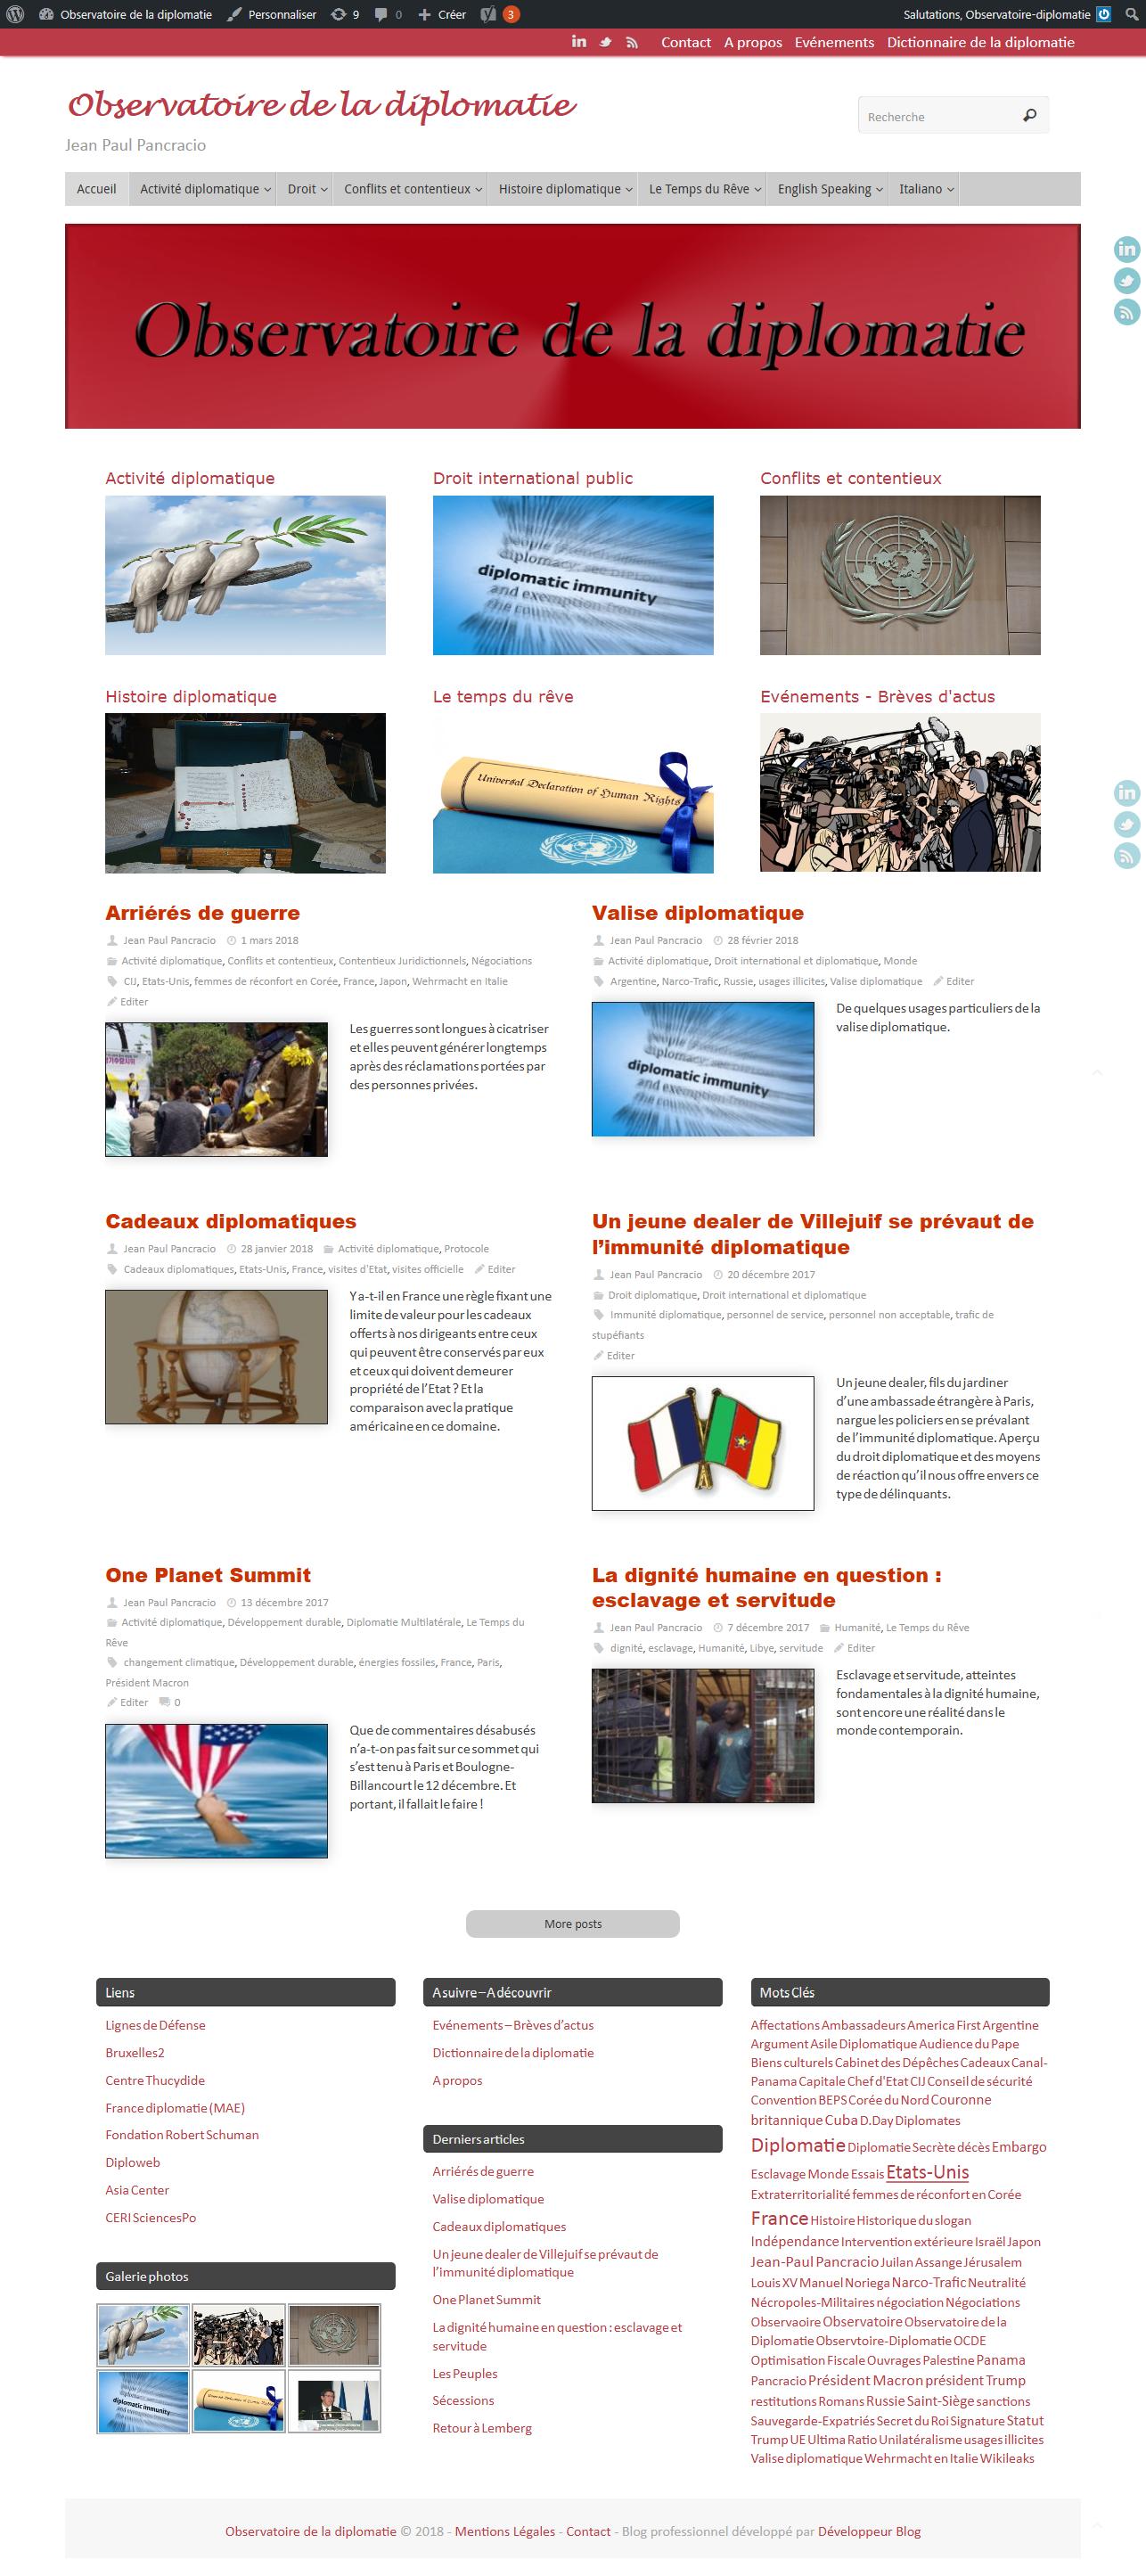 Observatoire de la diplomatie, blog de Jean Paul Pancracio